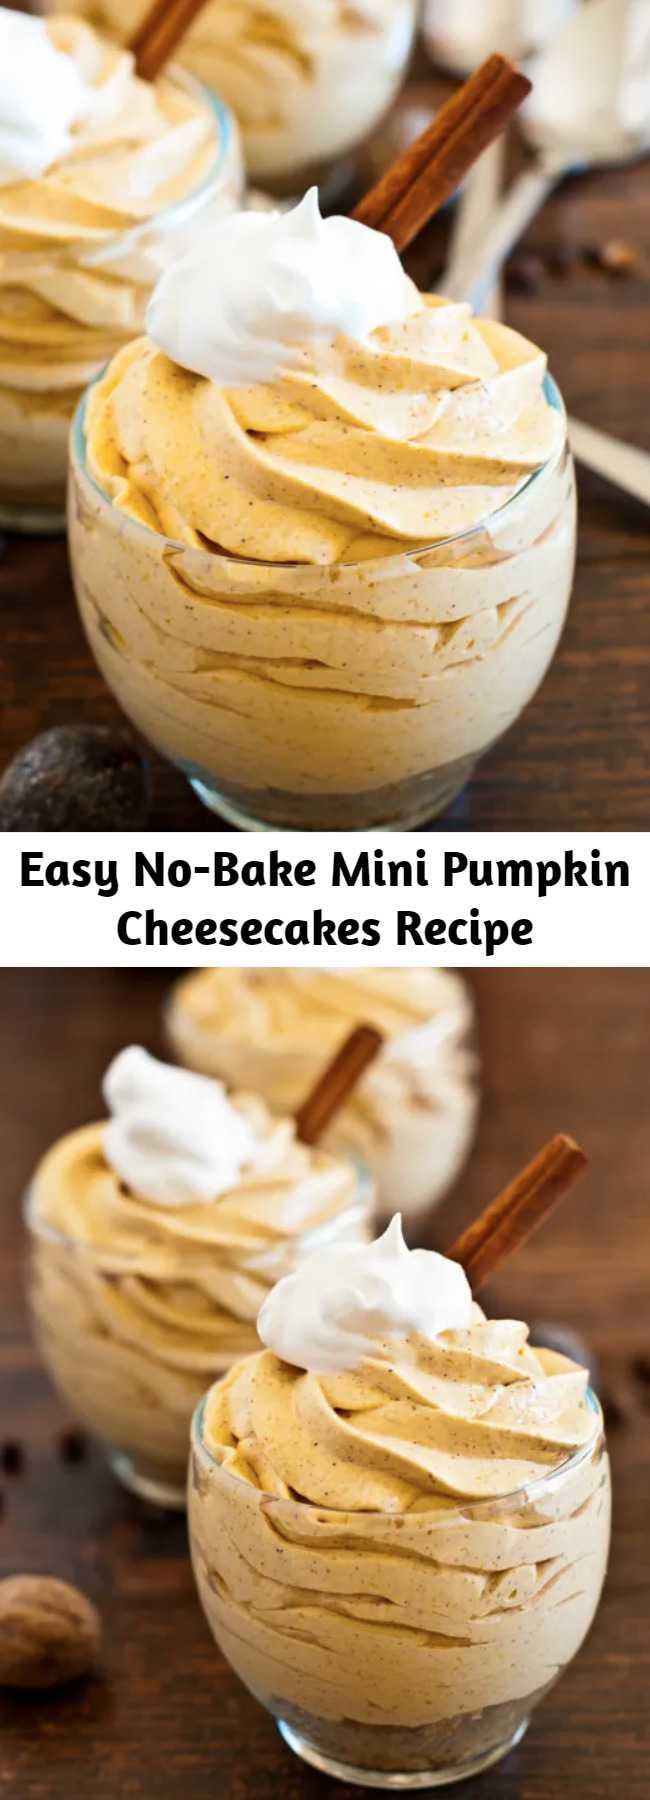 Easy No-Bake Mini Pumpkin Cheesecakes Recipe - These No-Bake Mini Pumpkin Cheesecakes are easy to make and so delicious! #PumpkinRecipe #pumpkin #cheesecake #FallDesserts